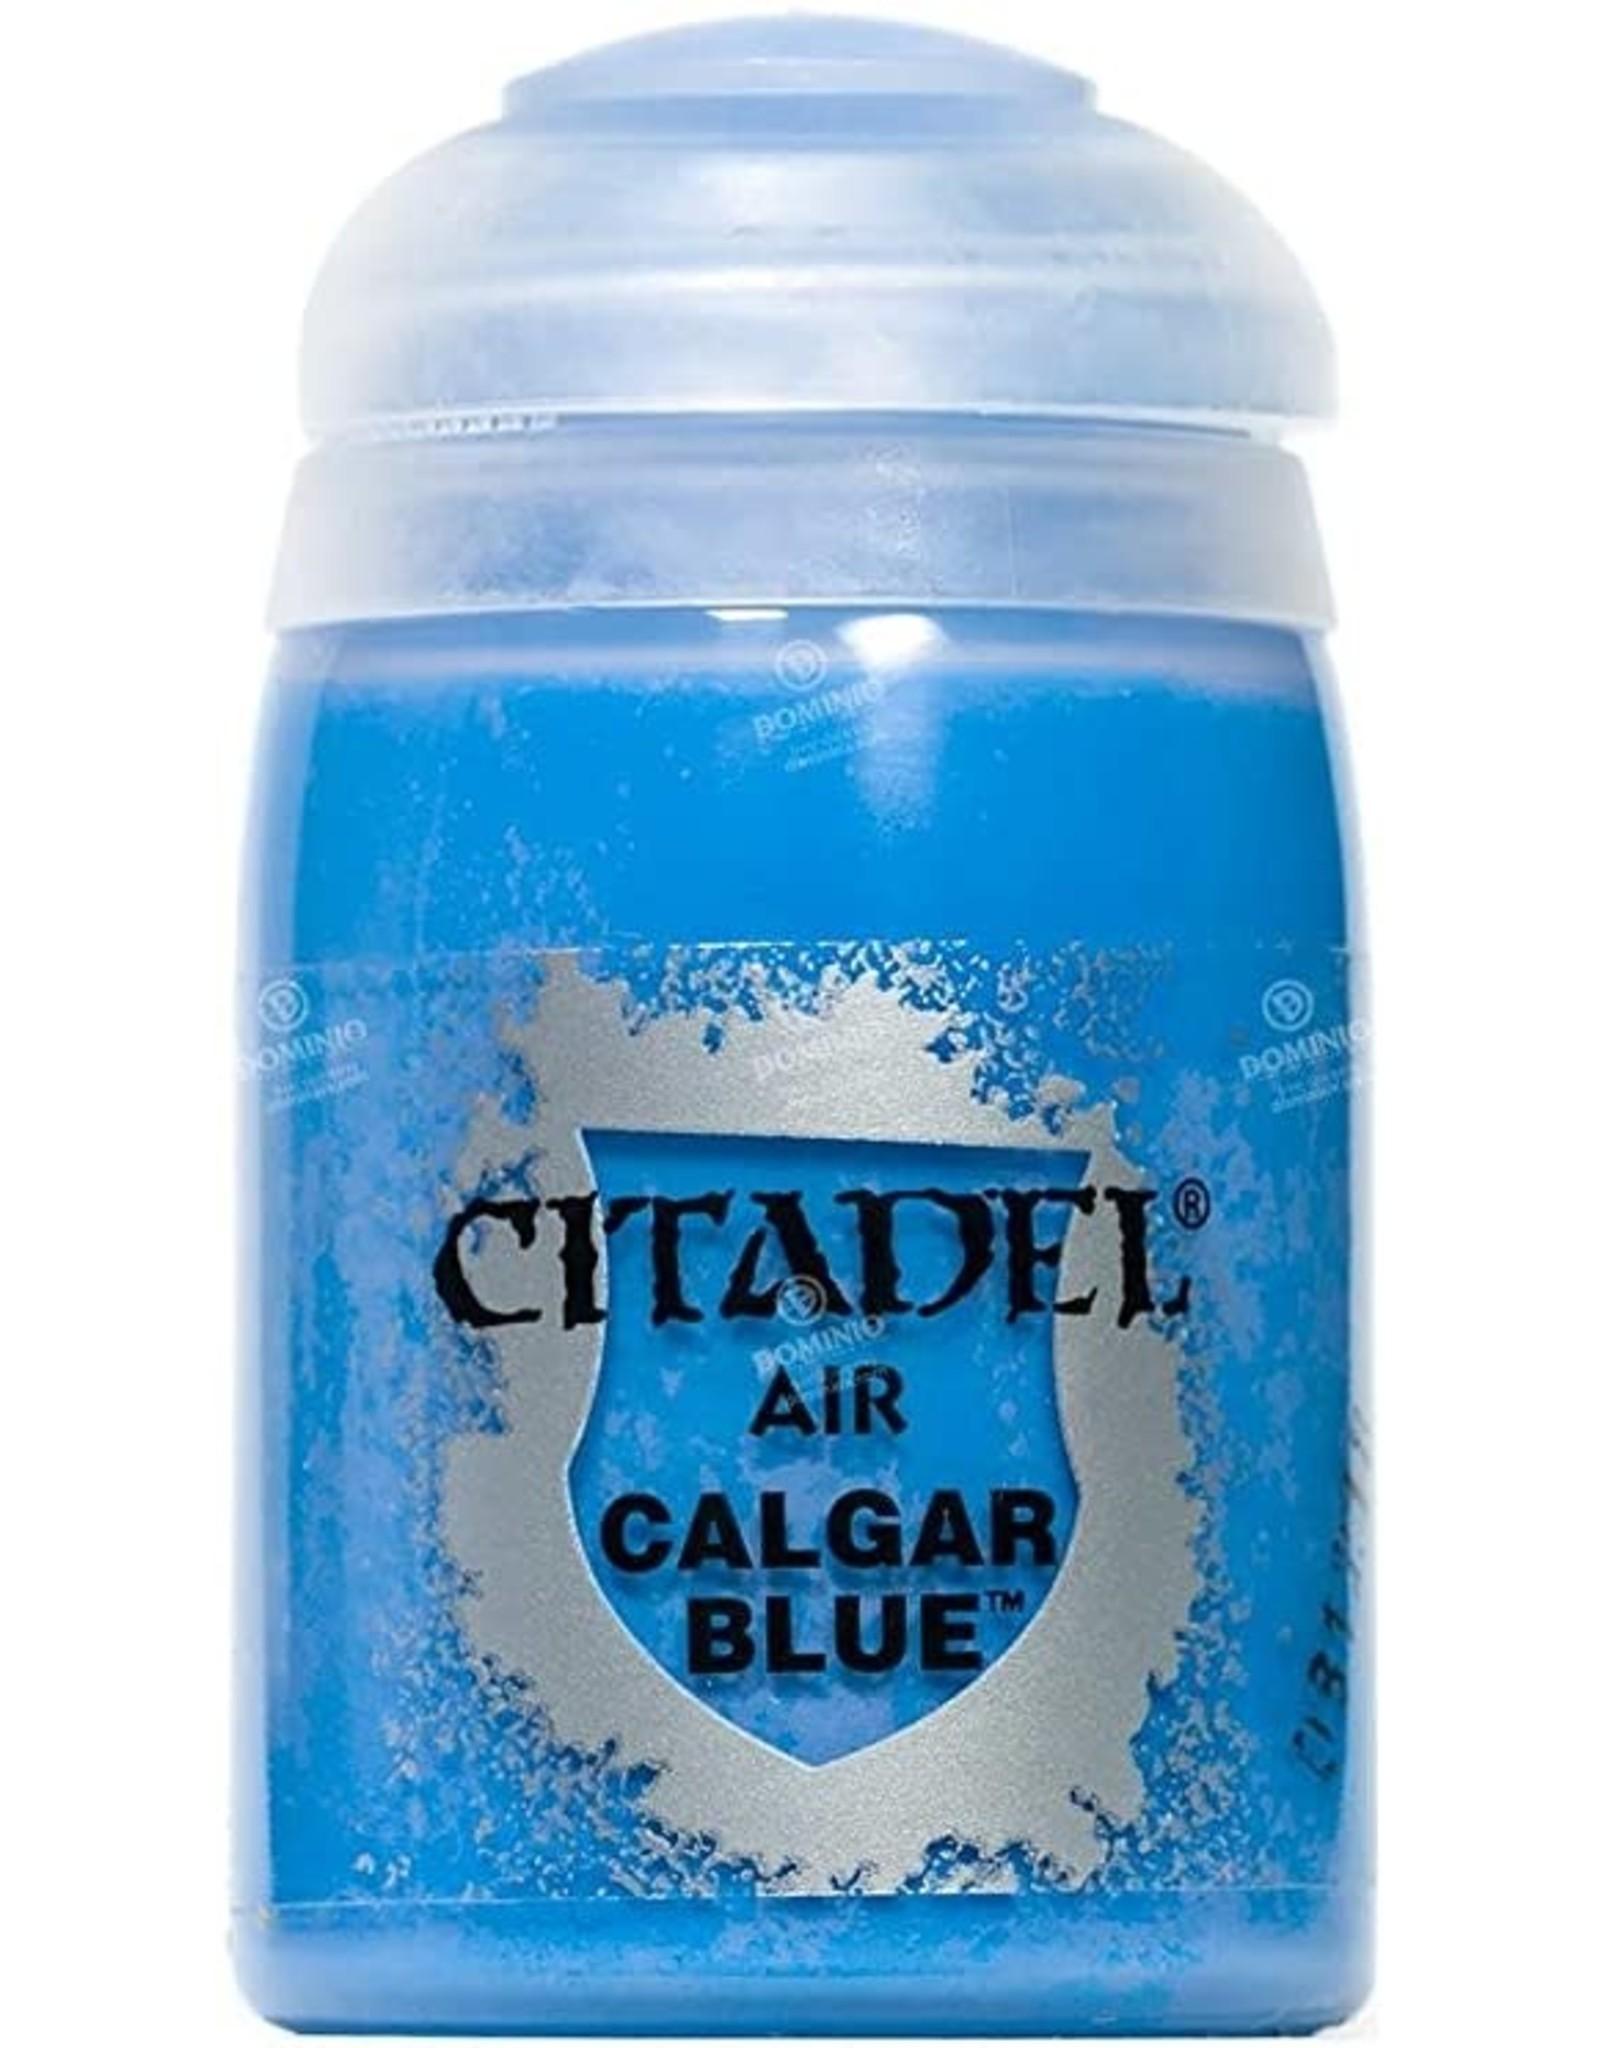 Games Workshop Citadel Paint: Calgar Blue Air (24 ml)